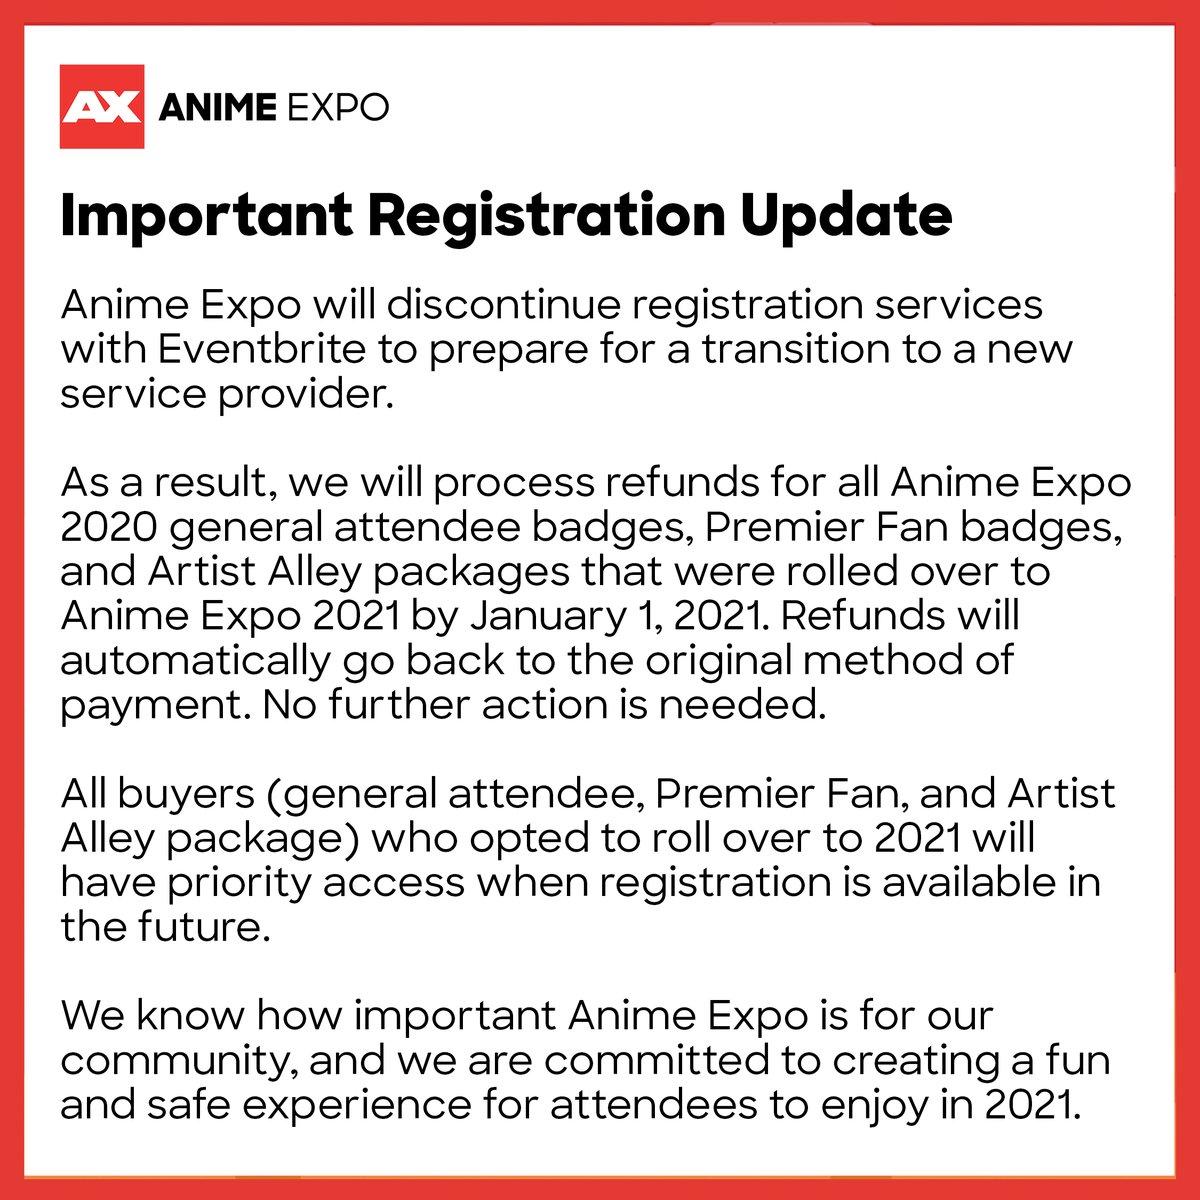 Important registration update  More info: https://t.co/MsaS4GjqmR https://t.co/tHfpWH5ZO6